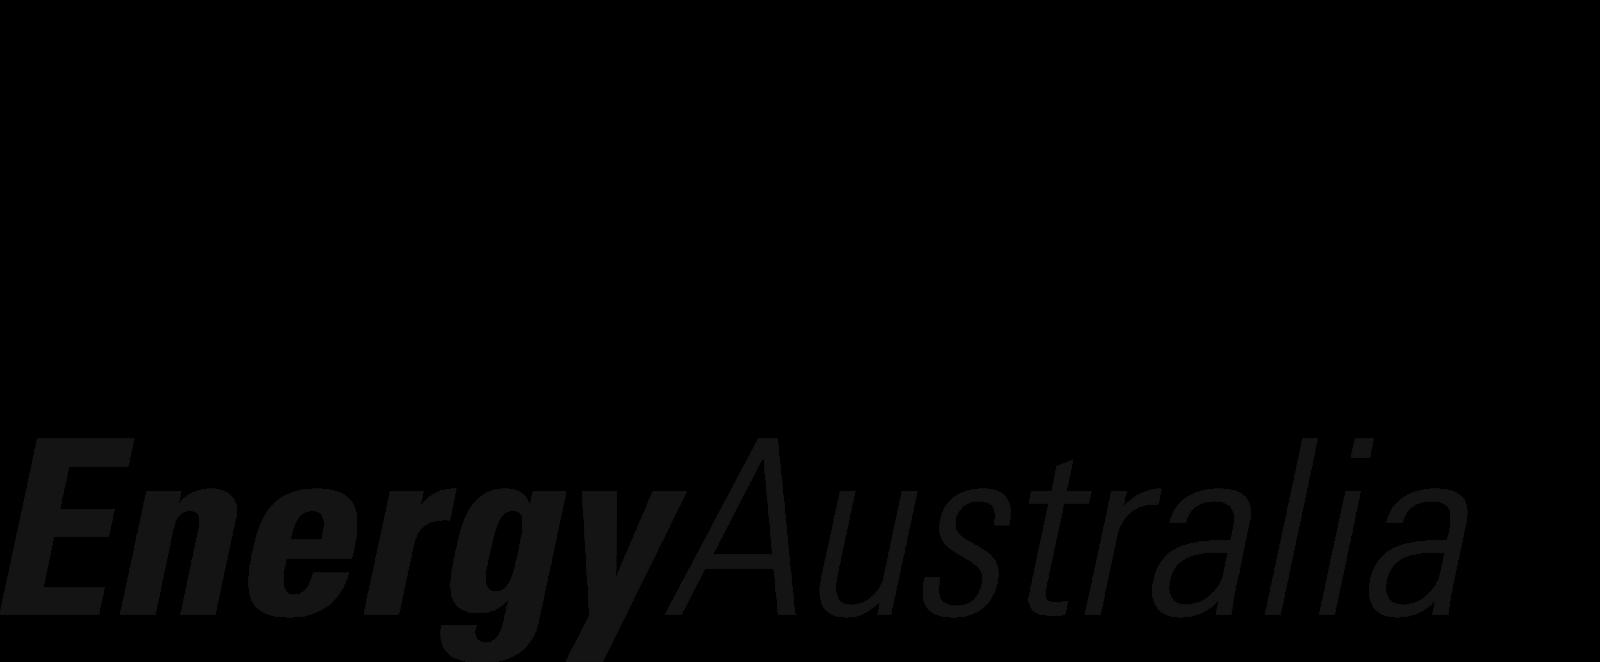 EnergyAustralia (former)